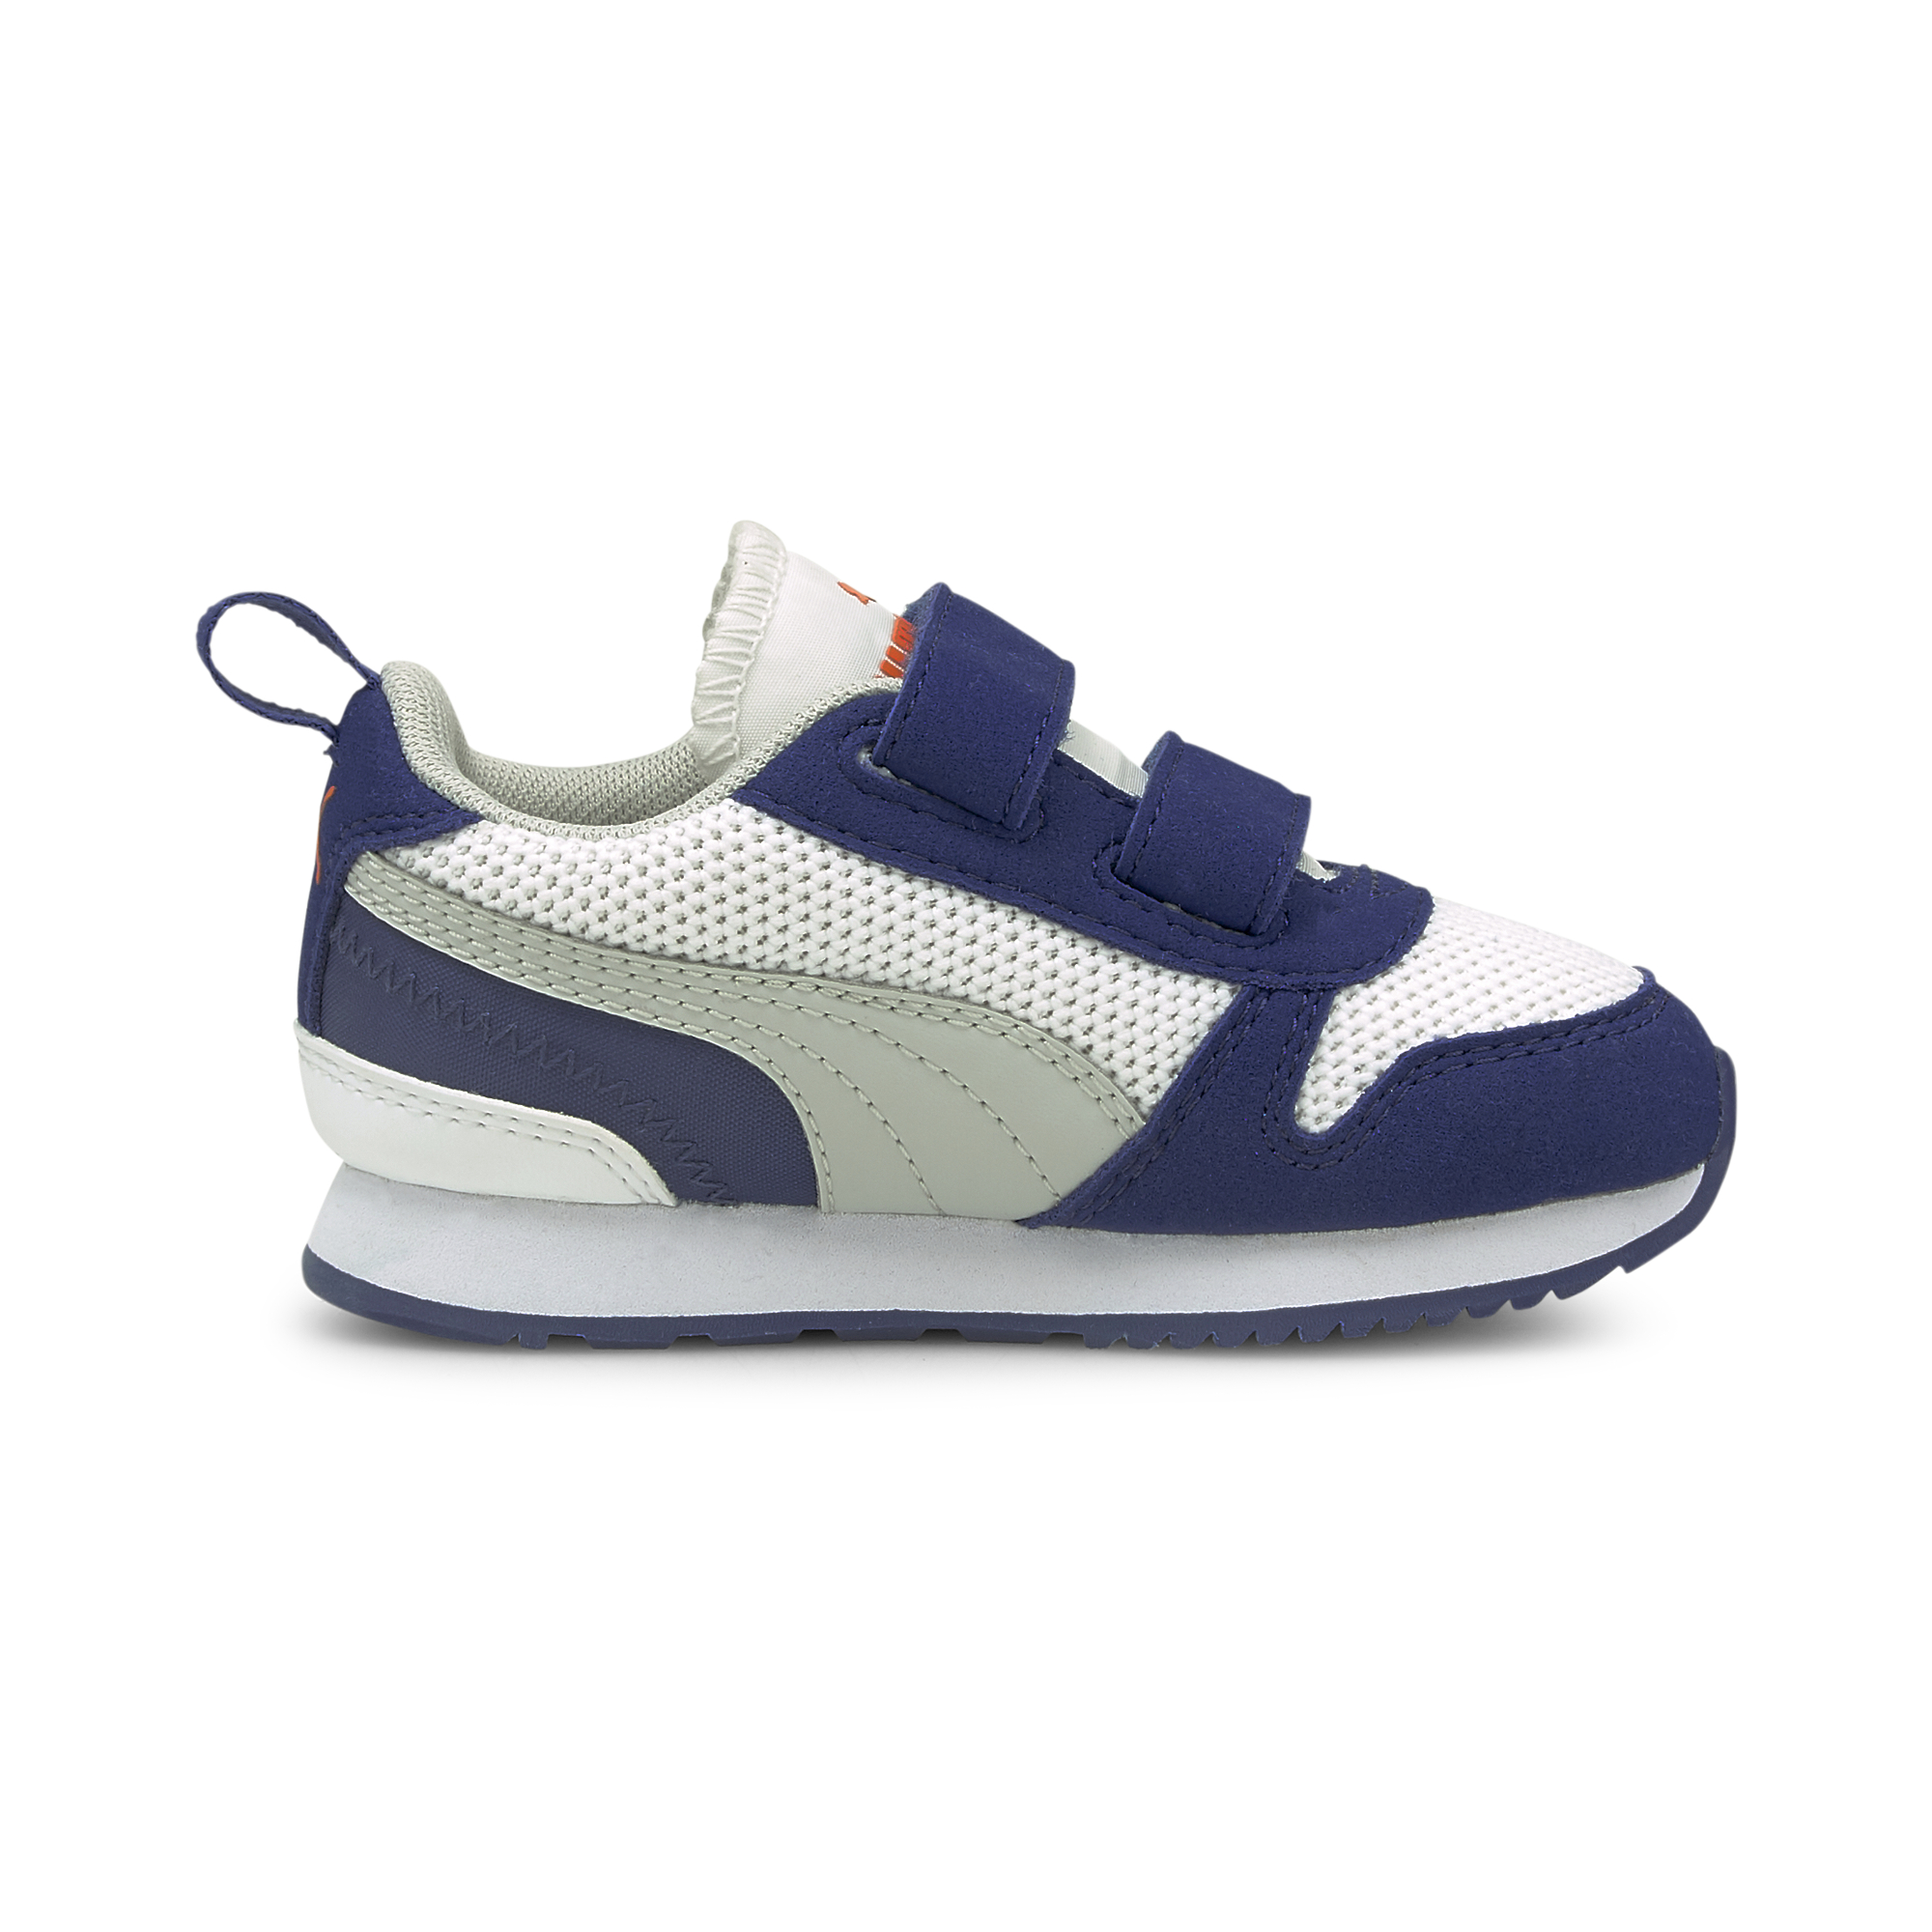 PUMA R 78 sneakers, white-grey-electro blue, 26